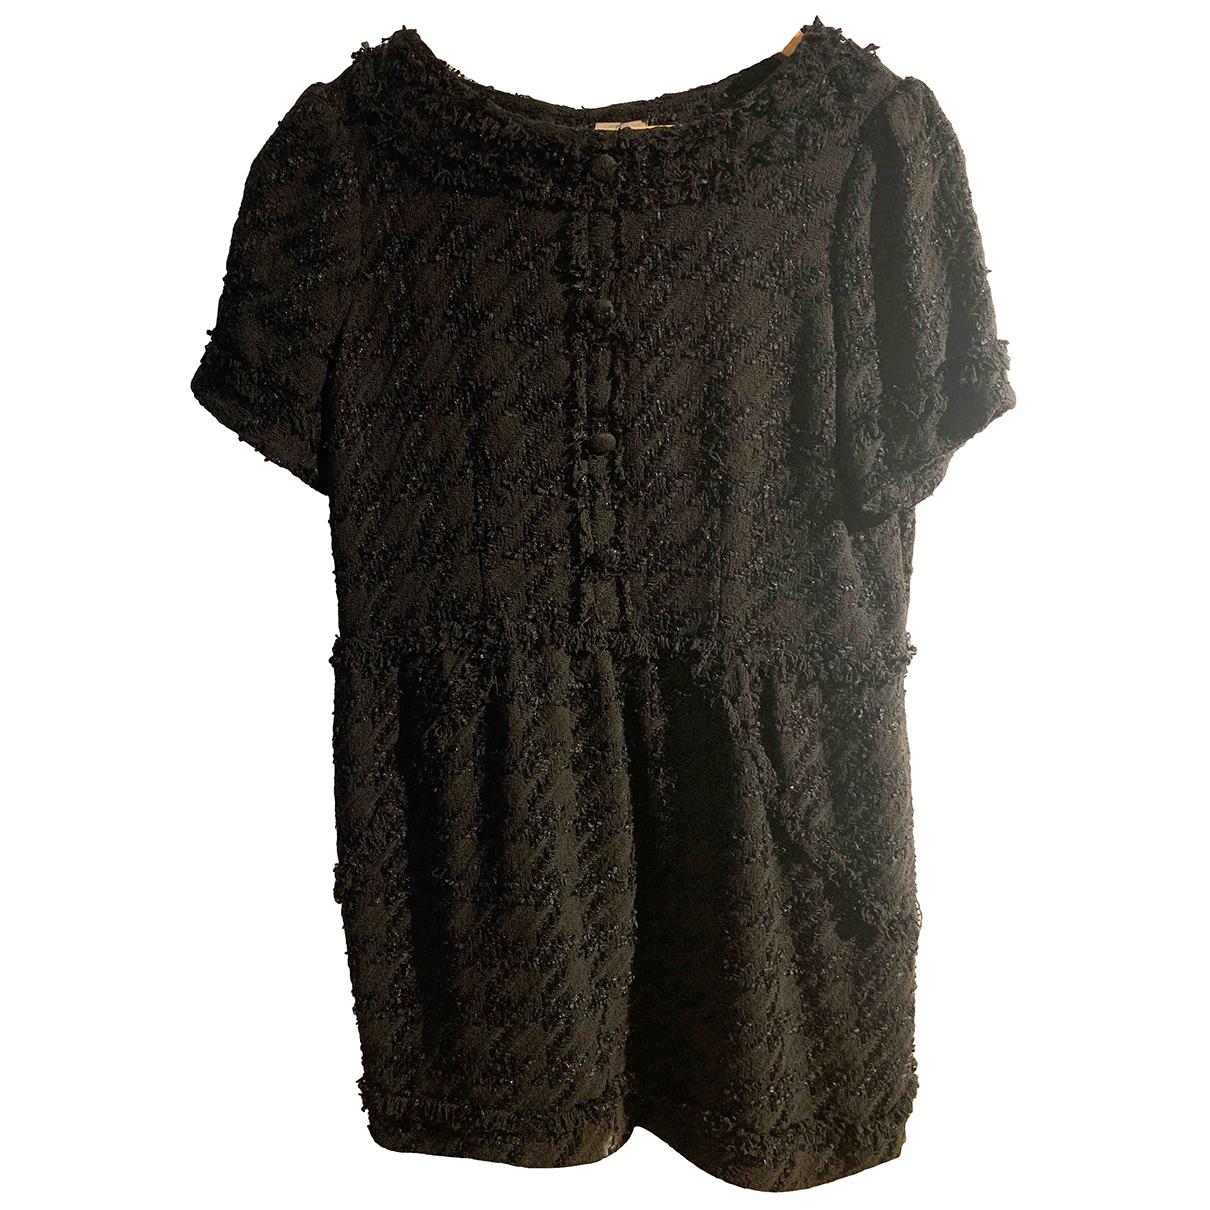 Uterque \N Black Cotton dress for Women L International